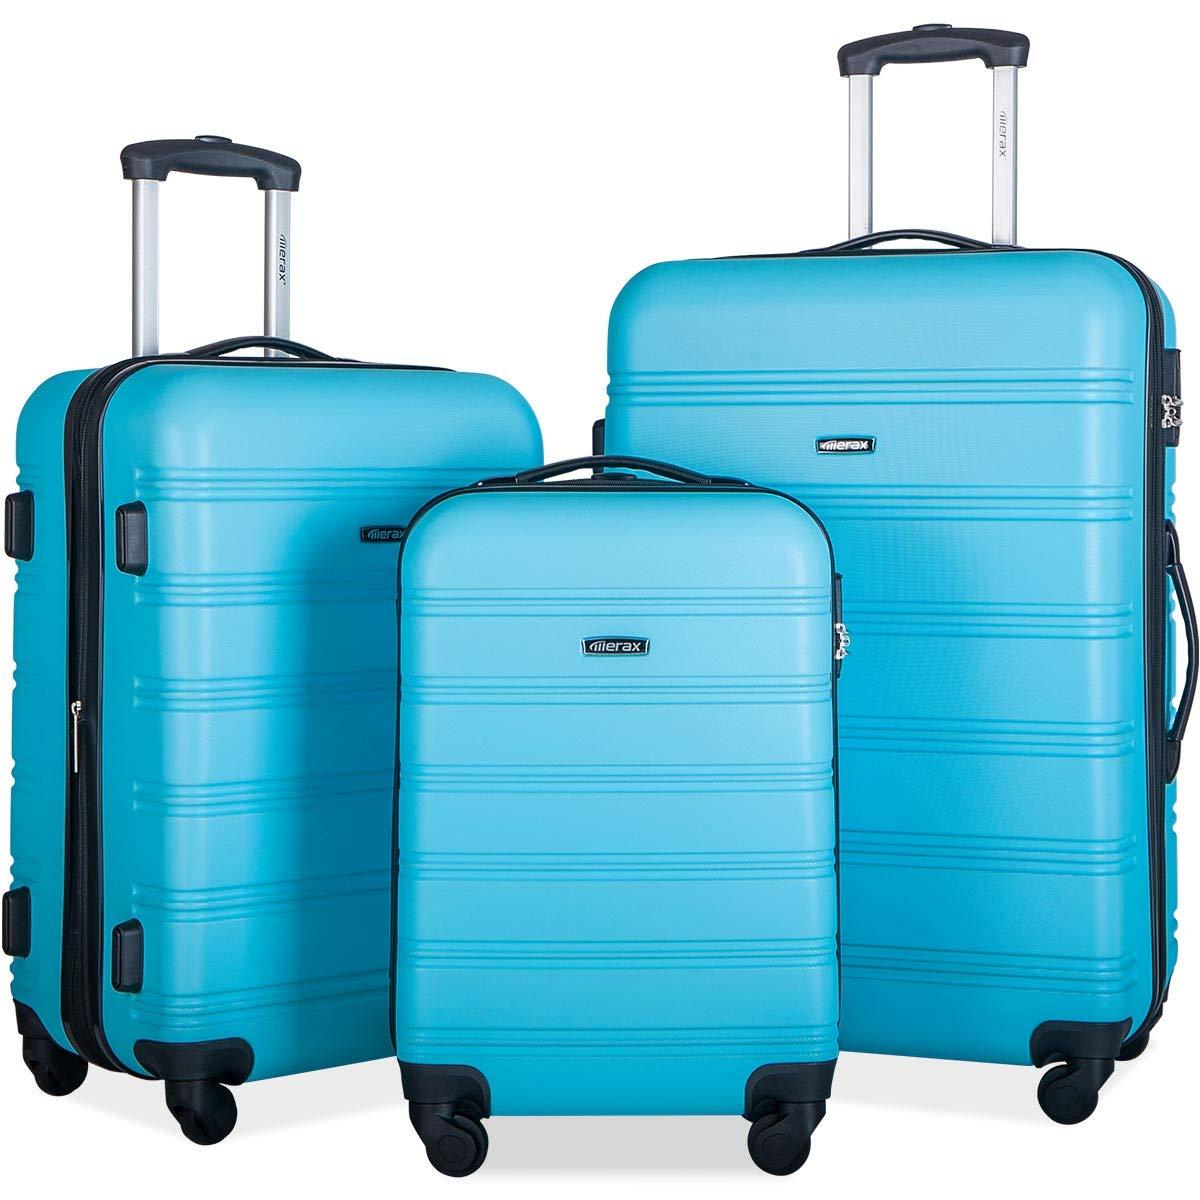 Merax 3 Pcs Luggage Set Expandable Hardside Lightweight Spinner Suitcase (Sky Blue)